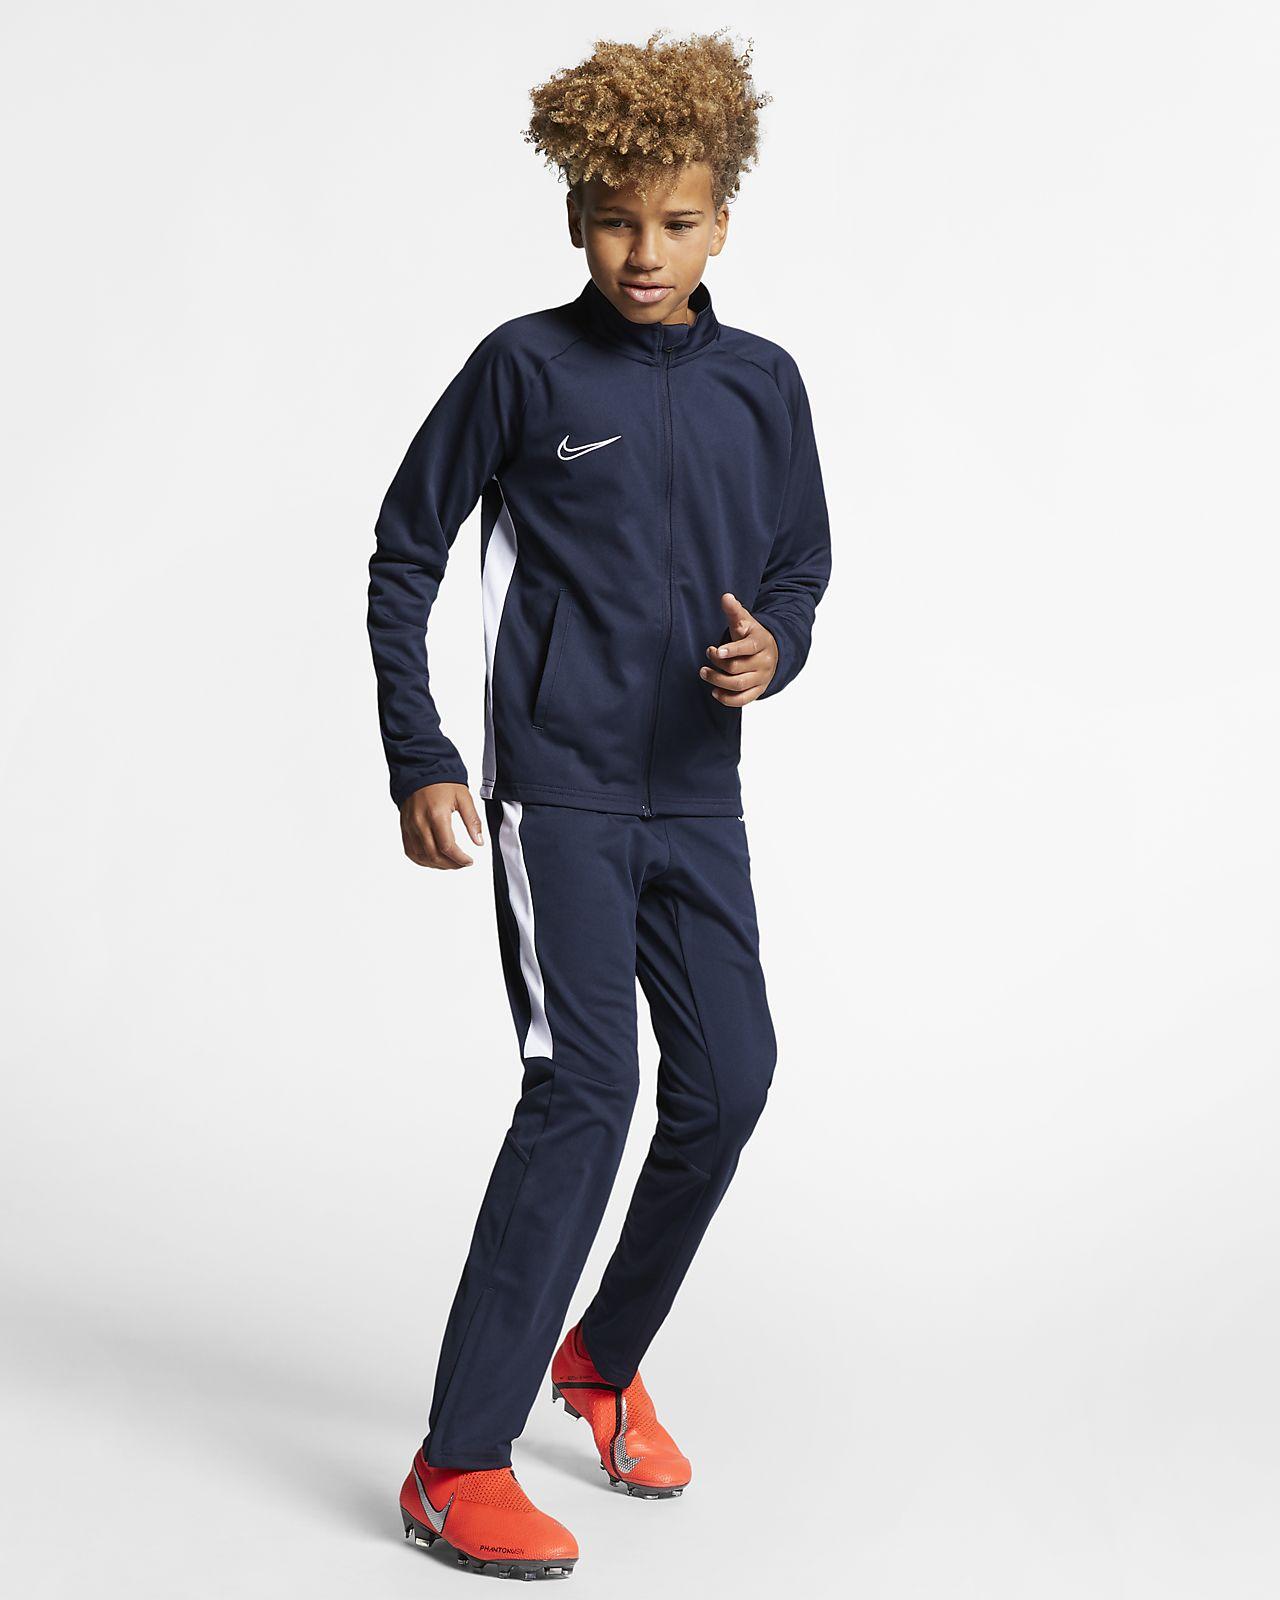 Nike Dri-FIT Academy Fußball-Trainingsanzug für ältere Kinder